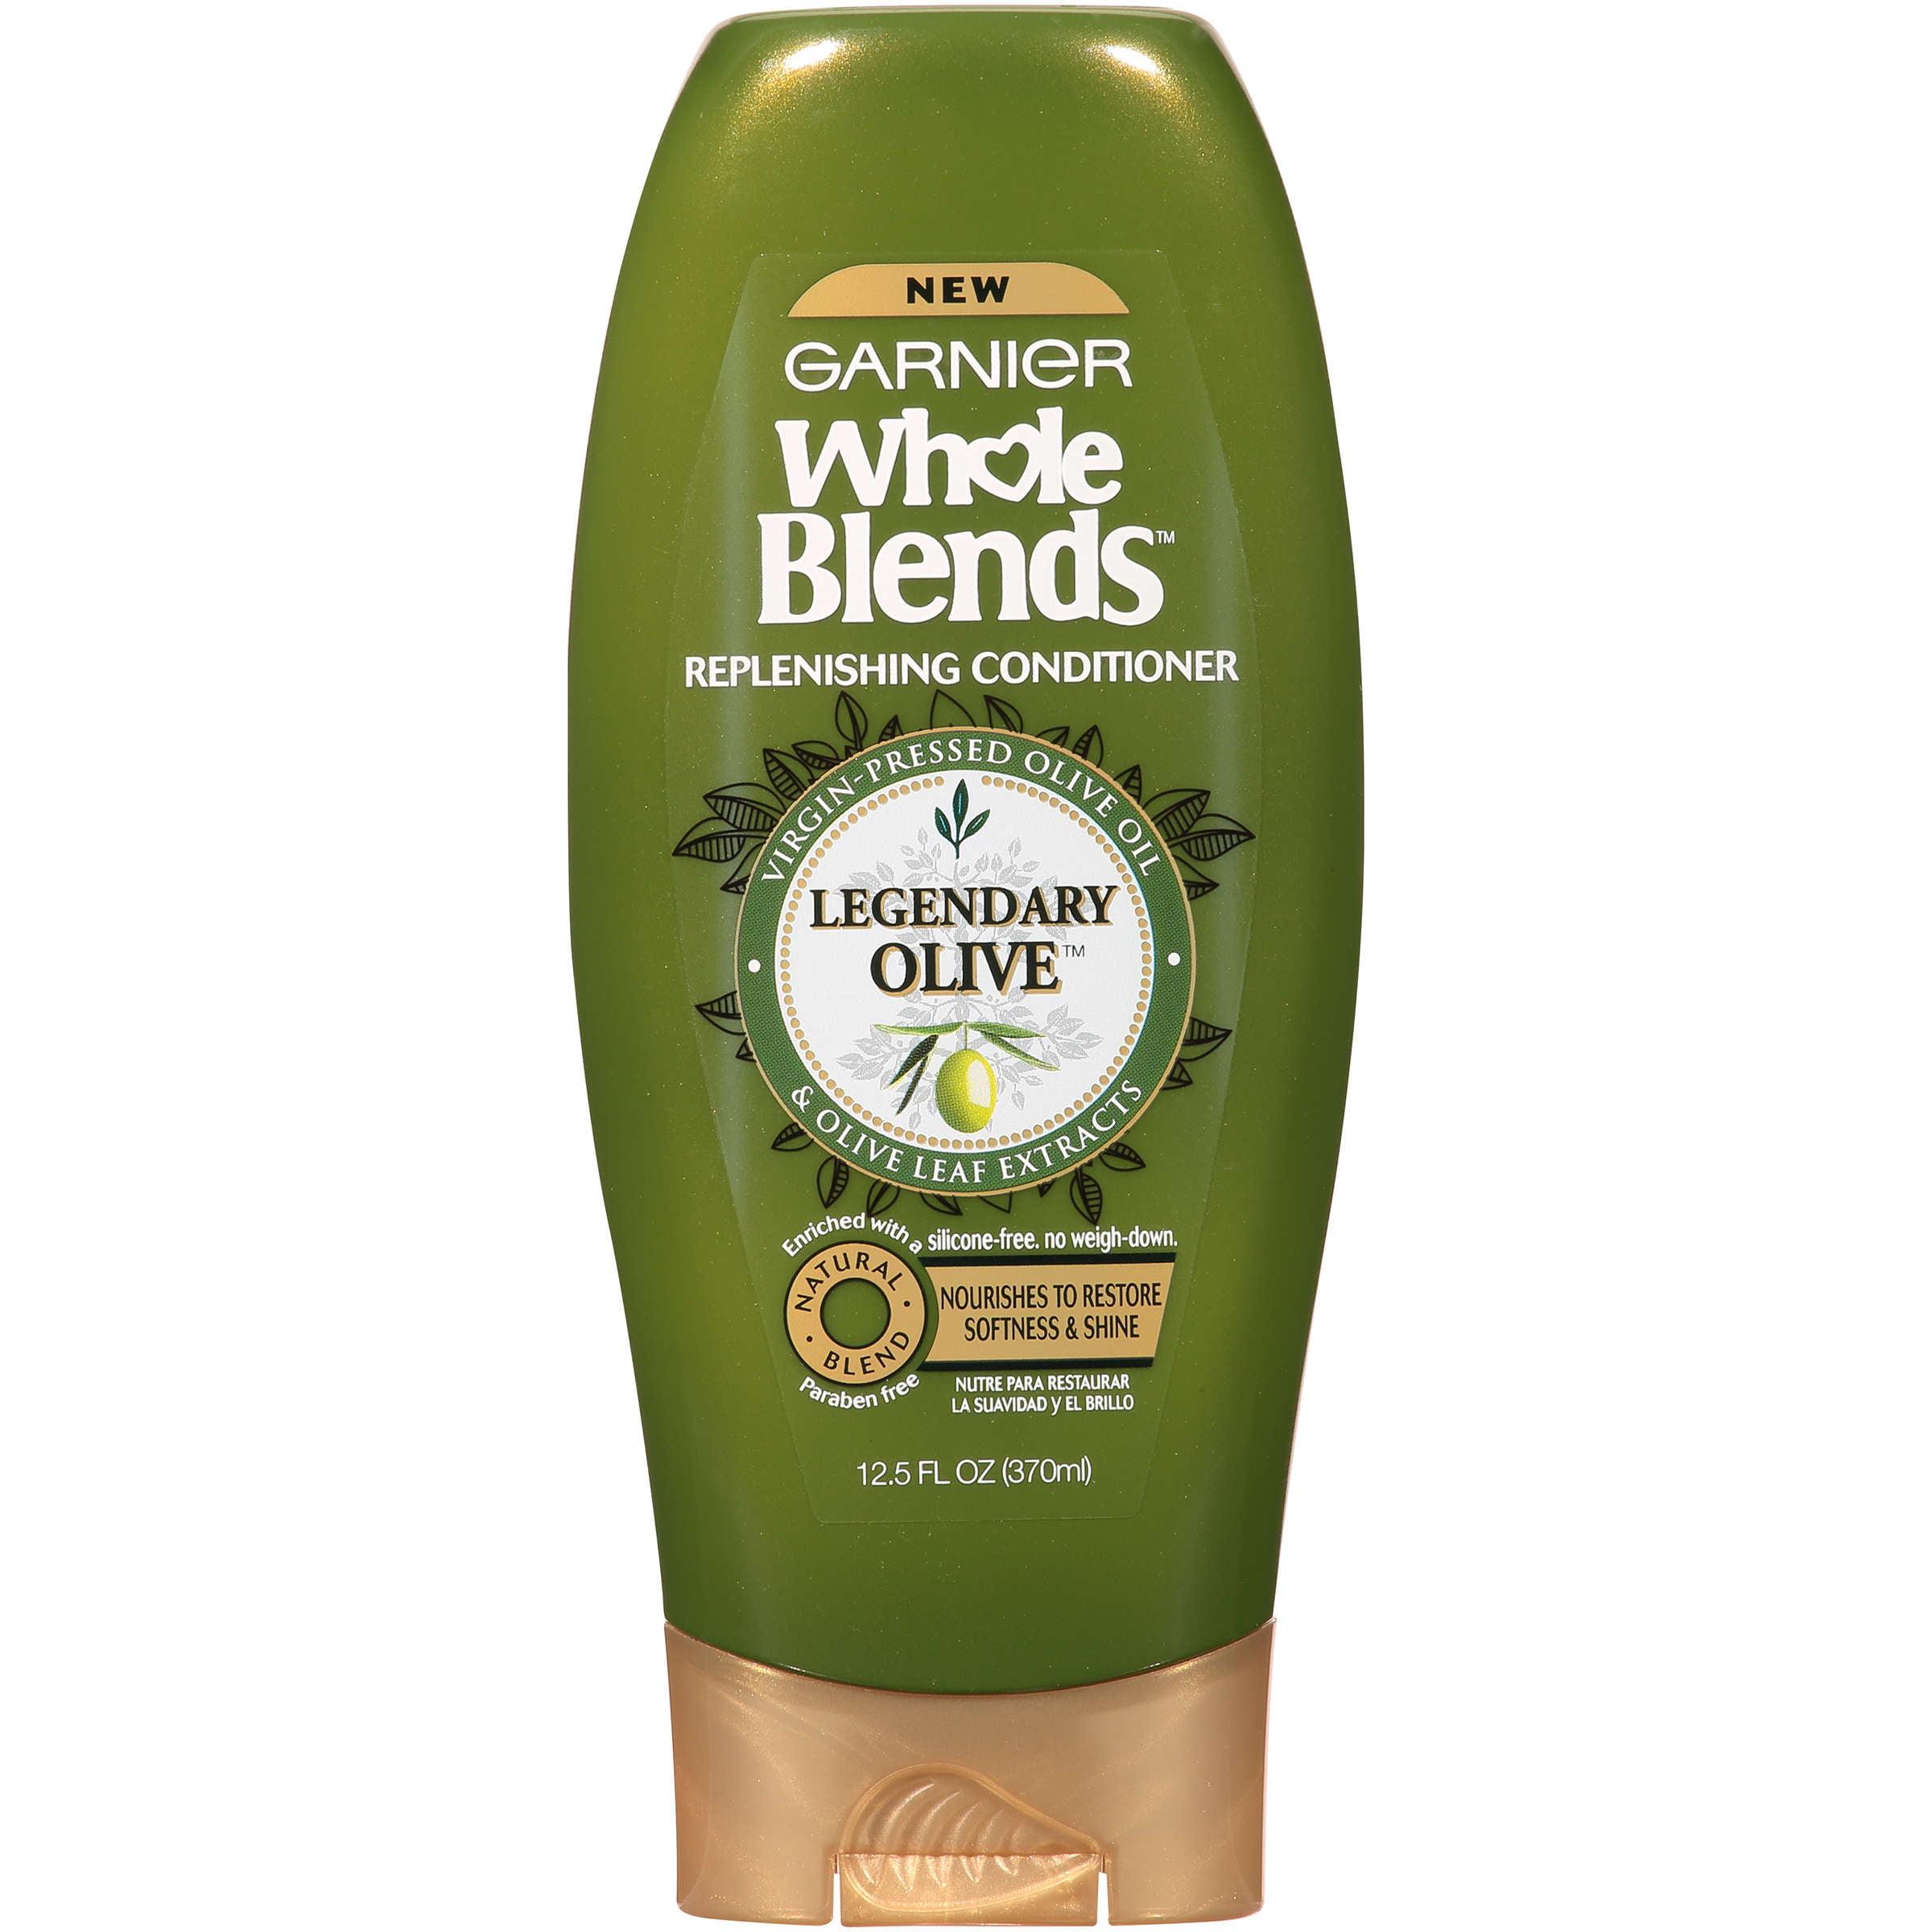 Garnier Whole Blends Replenishing Conditioner, 12.5 Fl Oz